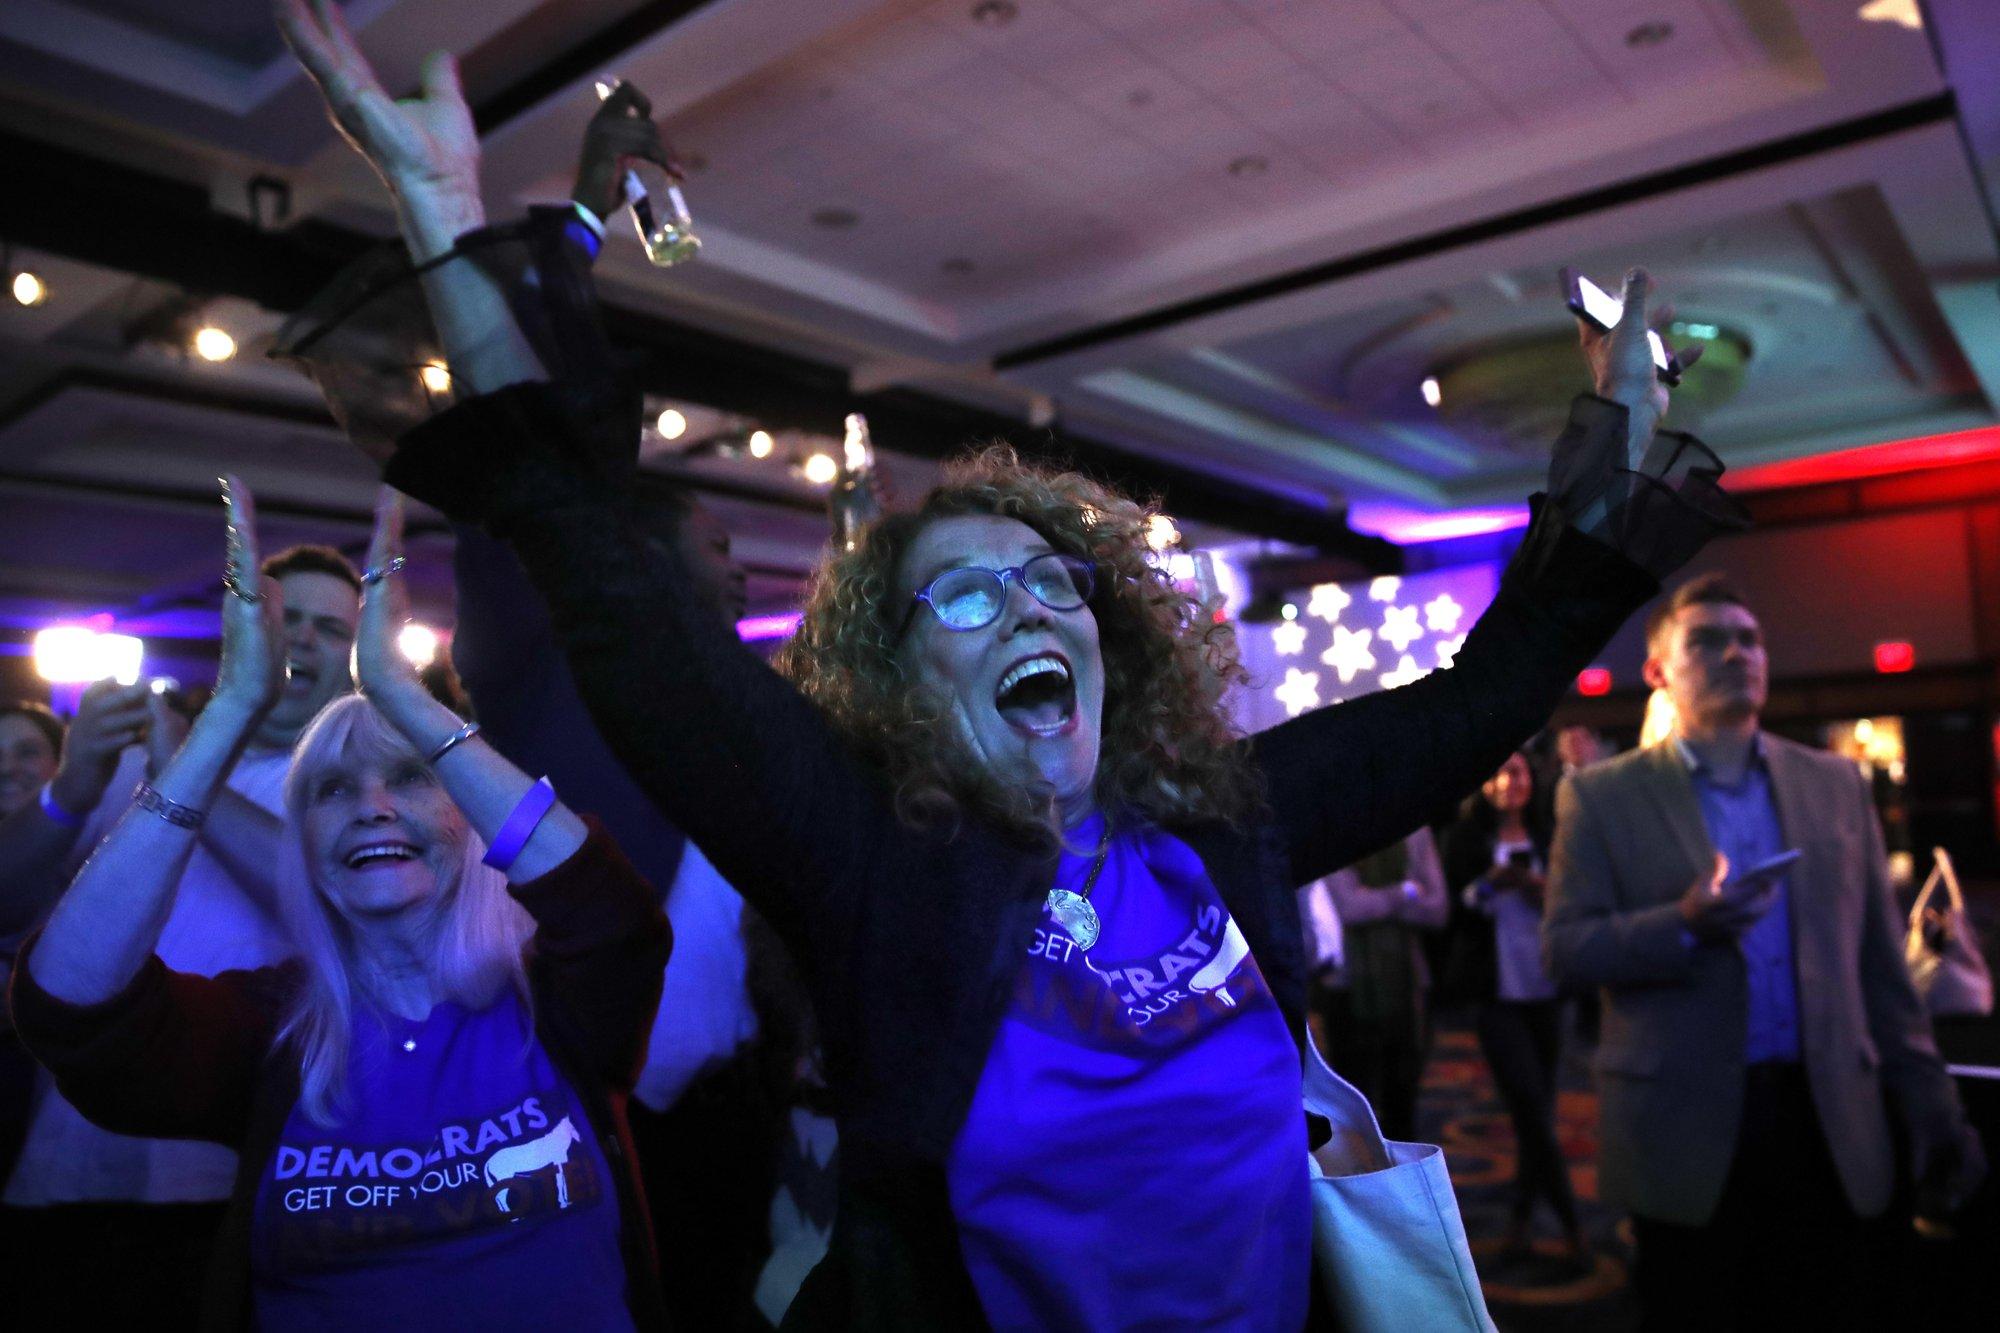 Democrats seize House control, but Trump's GOP holds Senate